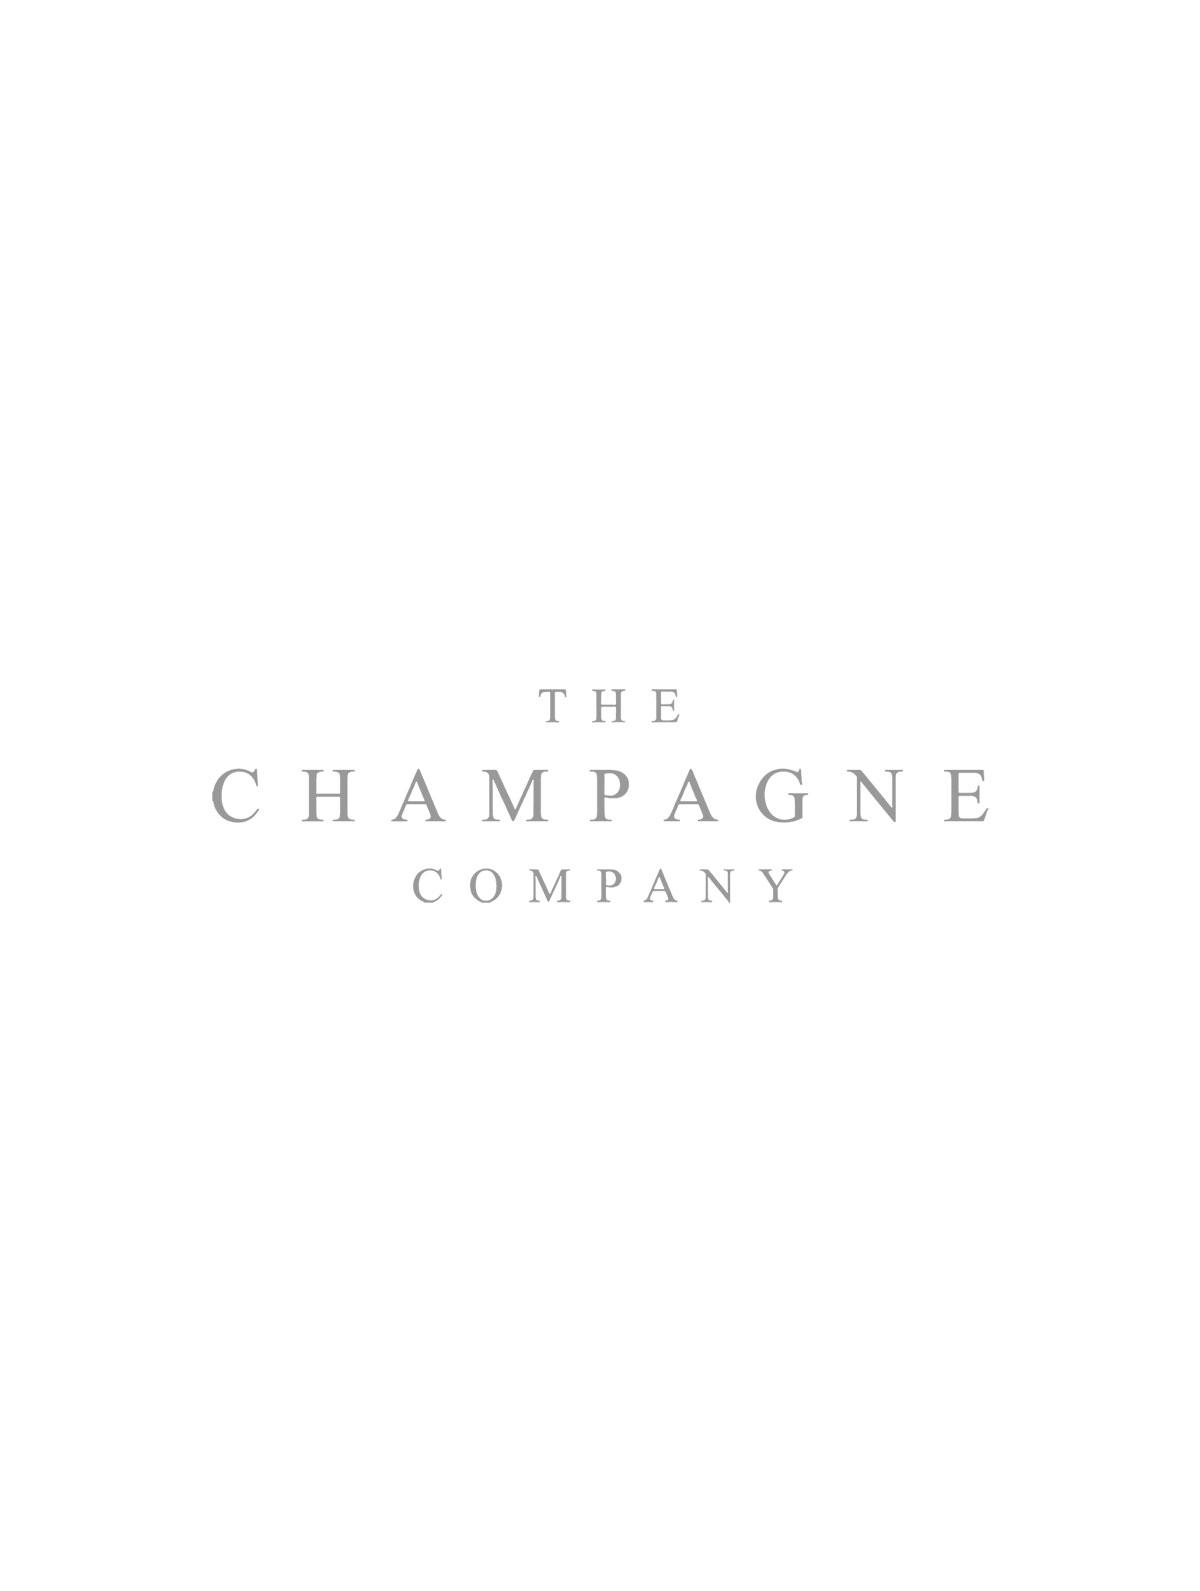 Mar De Frades Brut Nature NV Sparkling Wine Albarino Spain 75cl